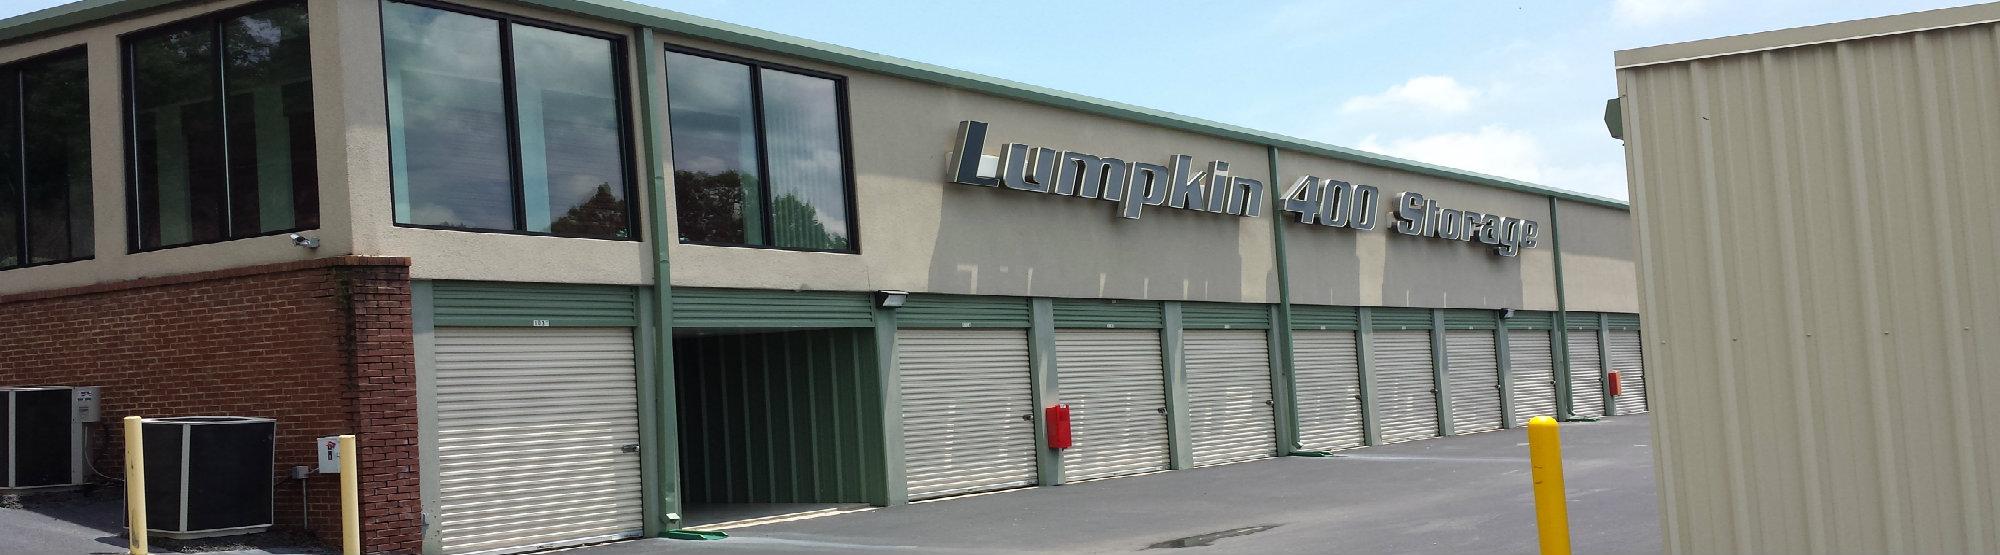 Lumpkin 400 Storage exterior